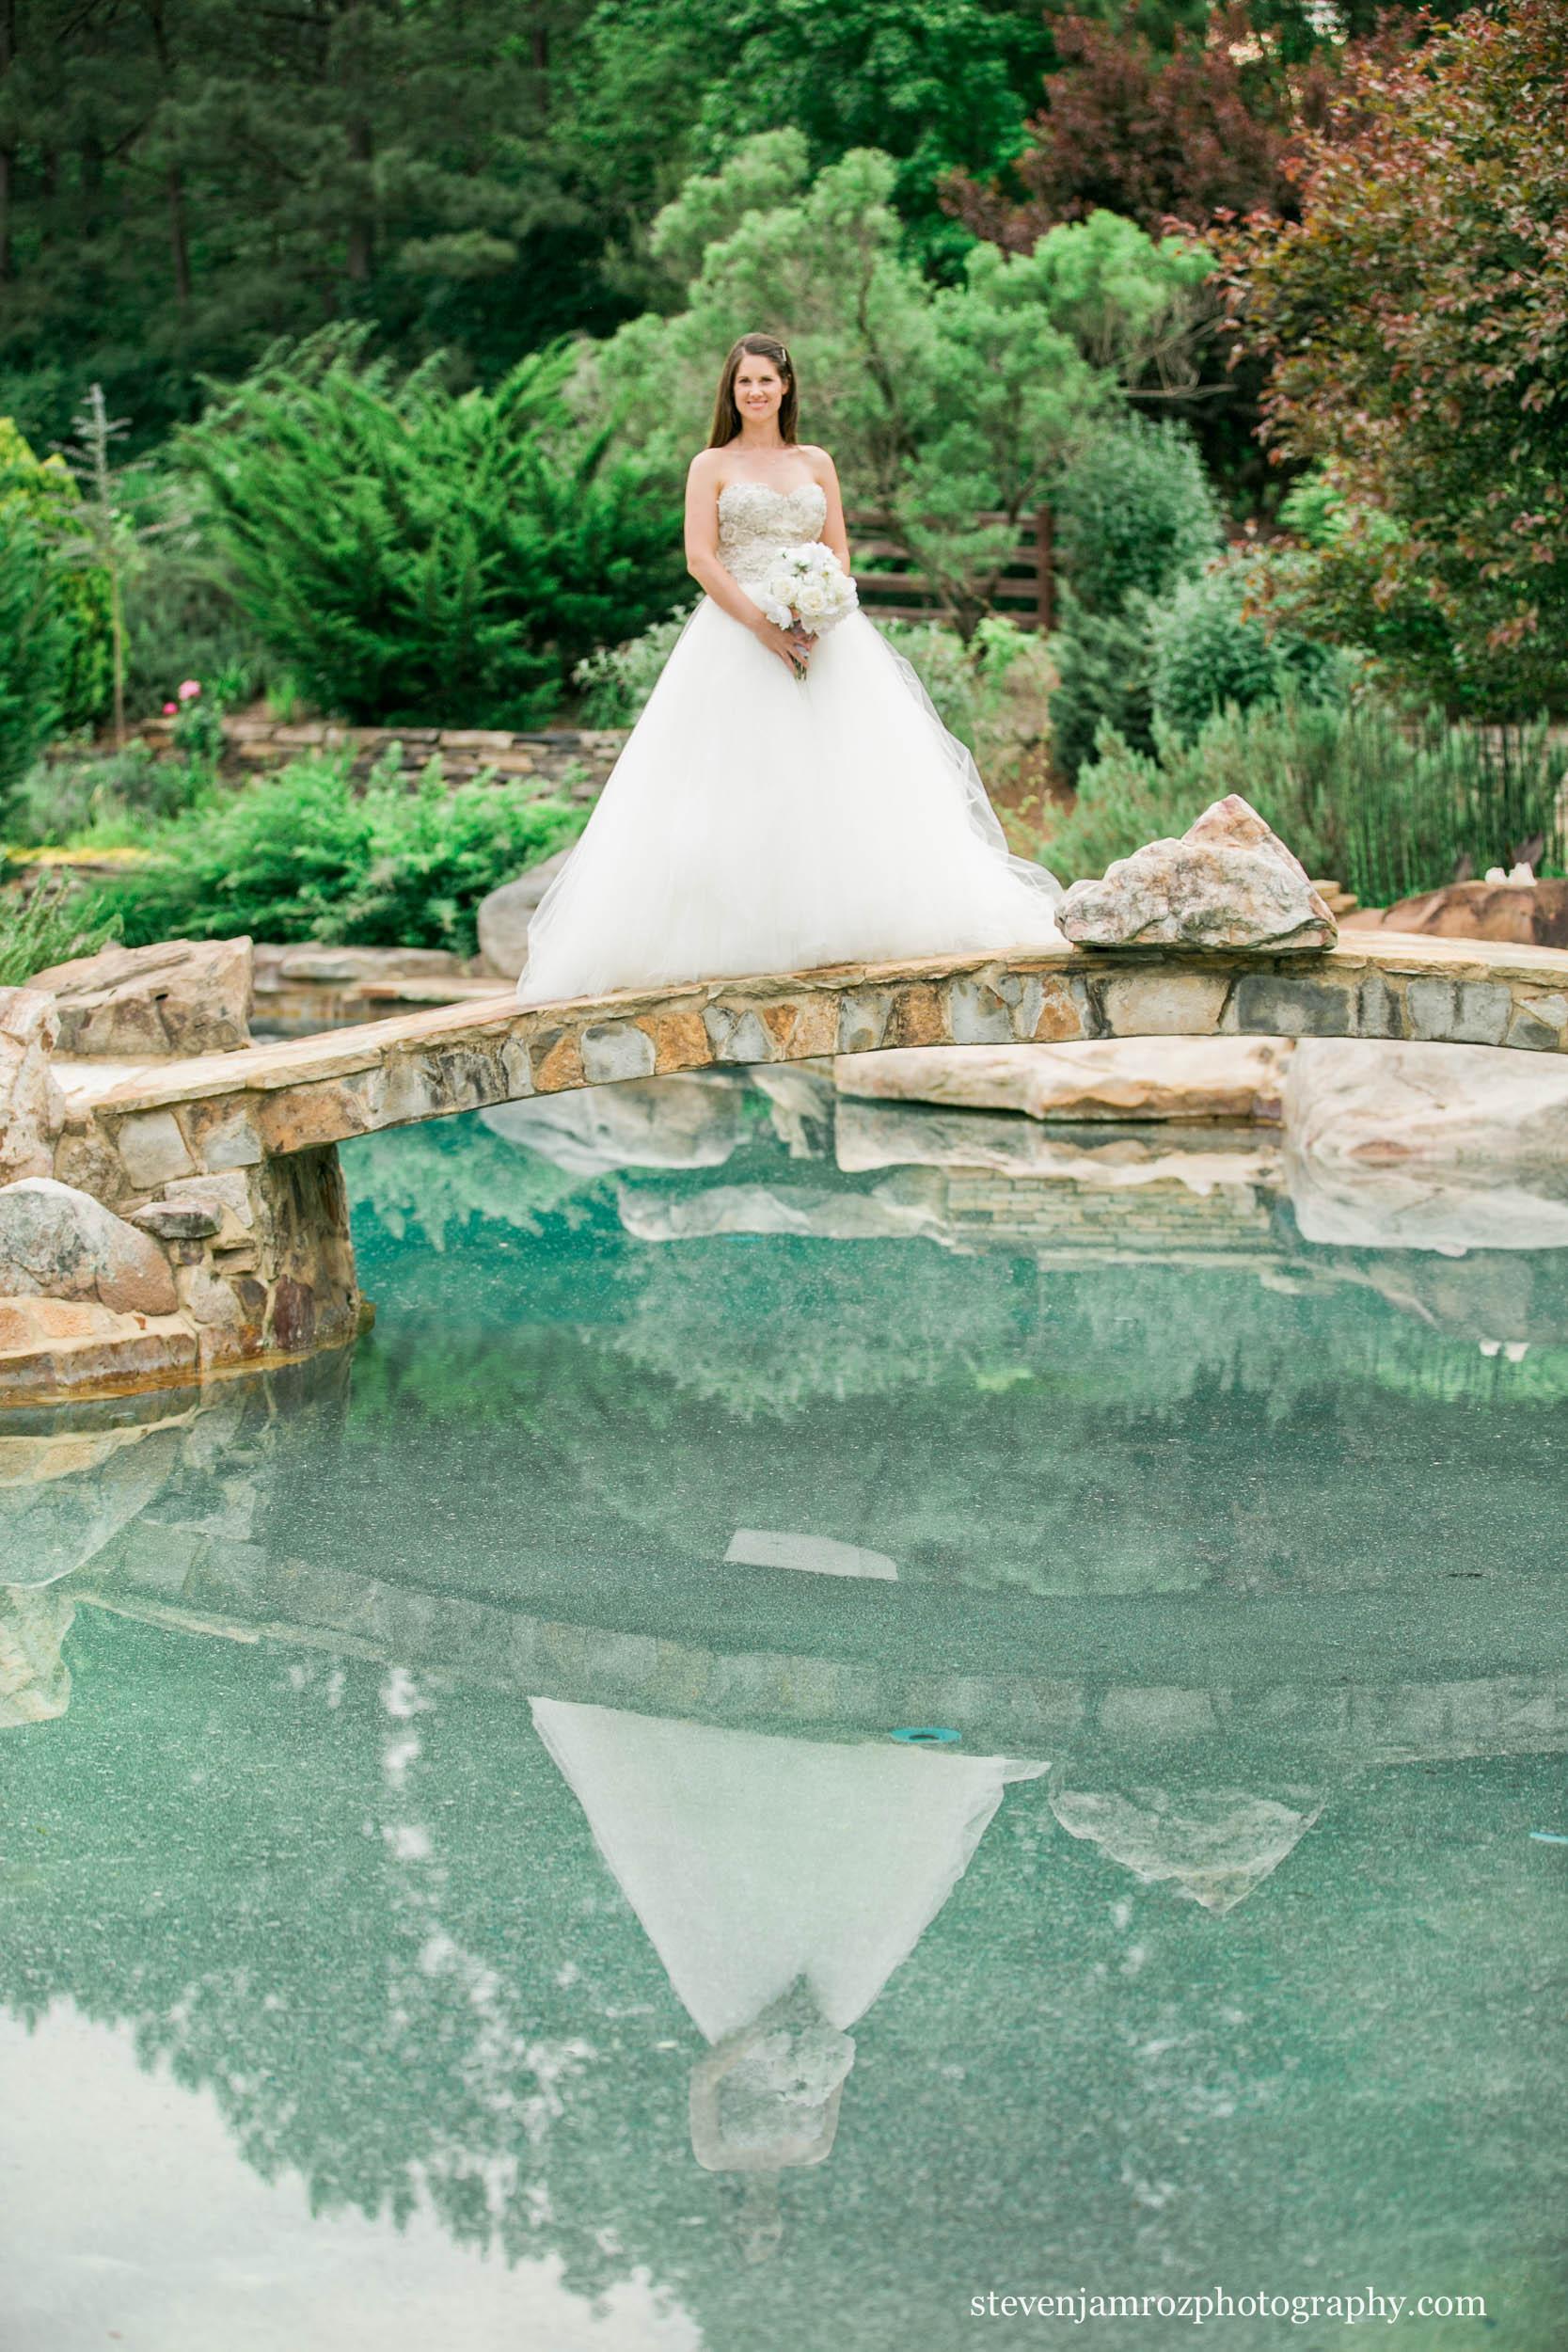 bridal-images-chapel-hill-nc-steven-jamroz-photography-0455.jpg